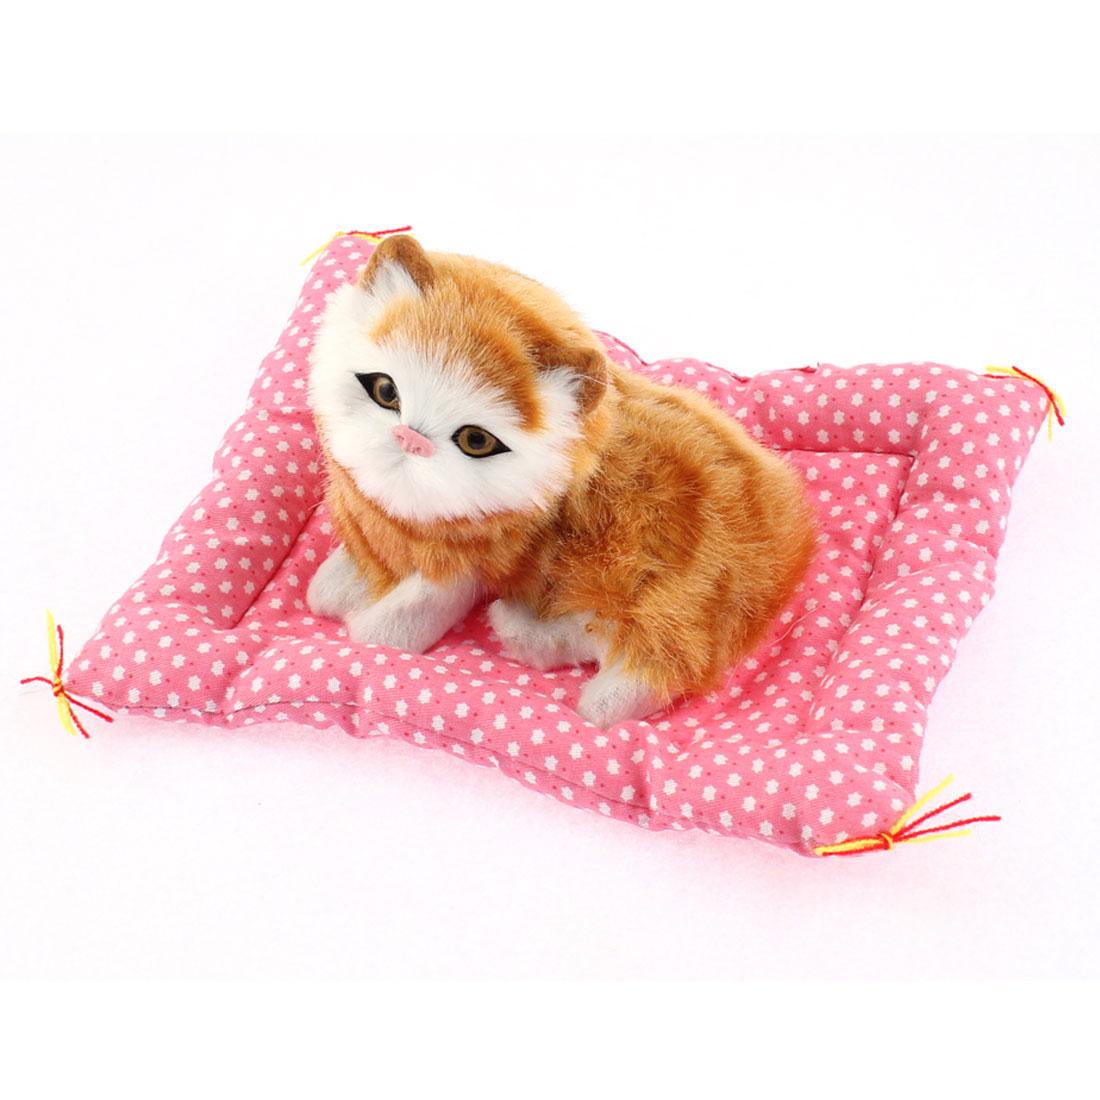 Home Car Simulation Sound Squatting Cat Craft Decoration